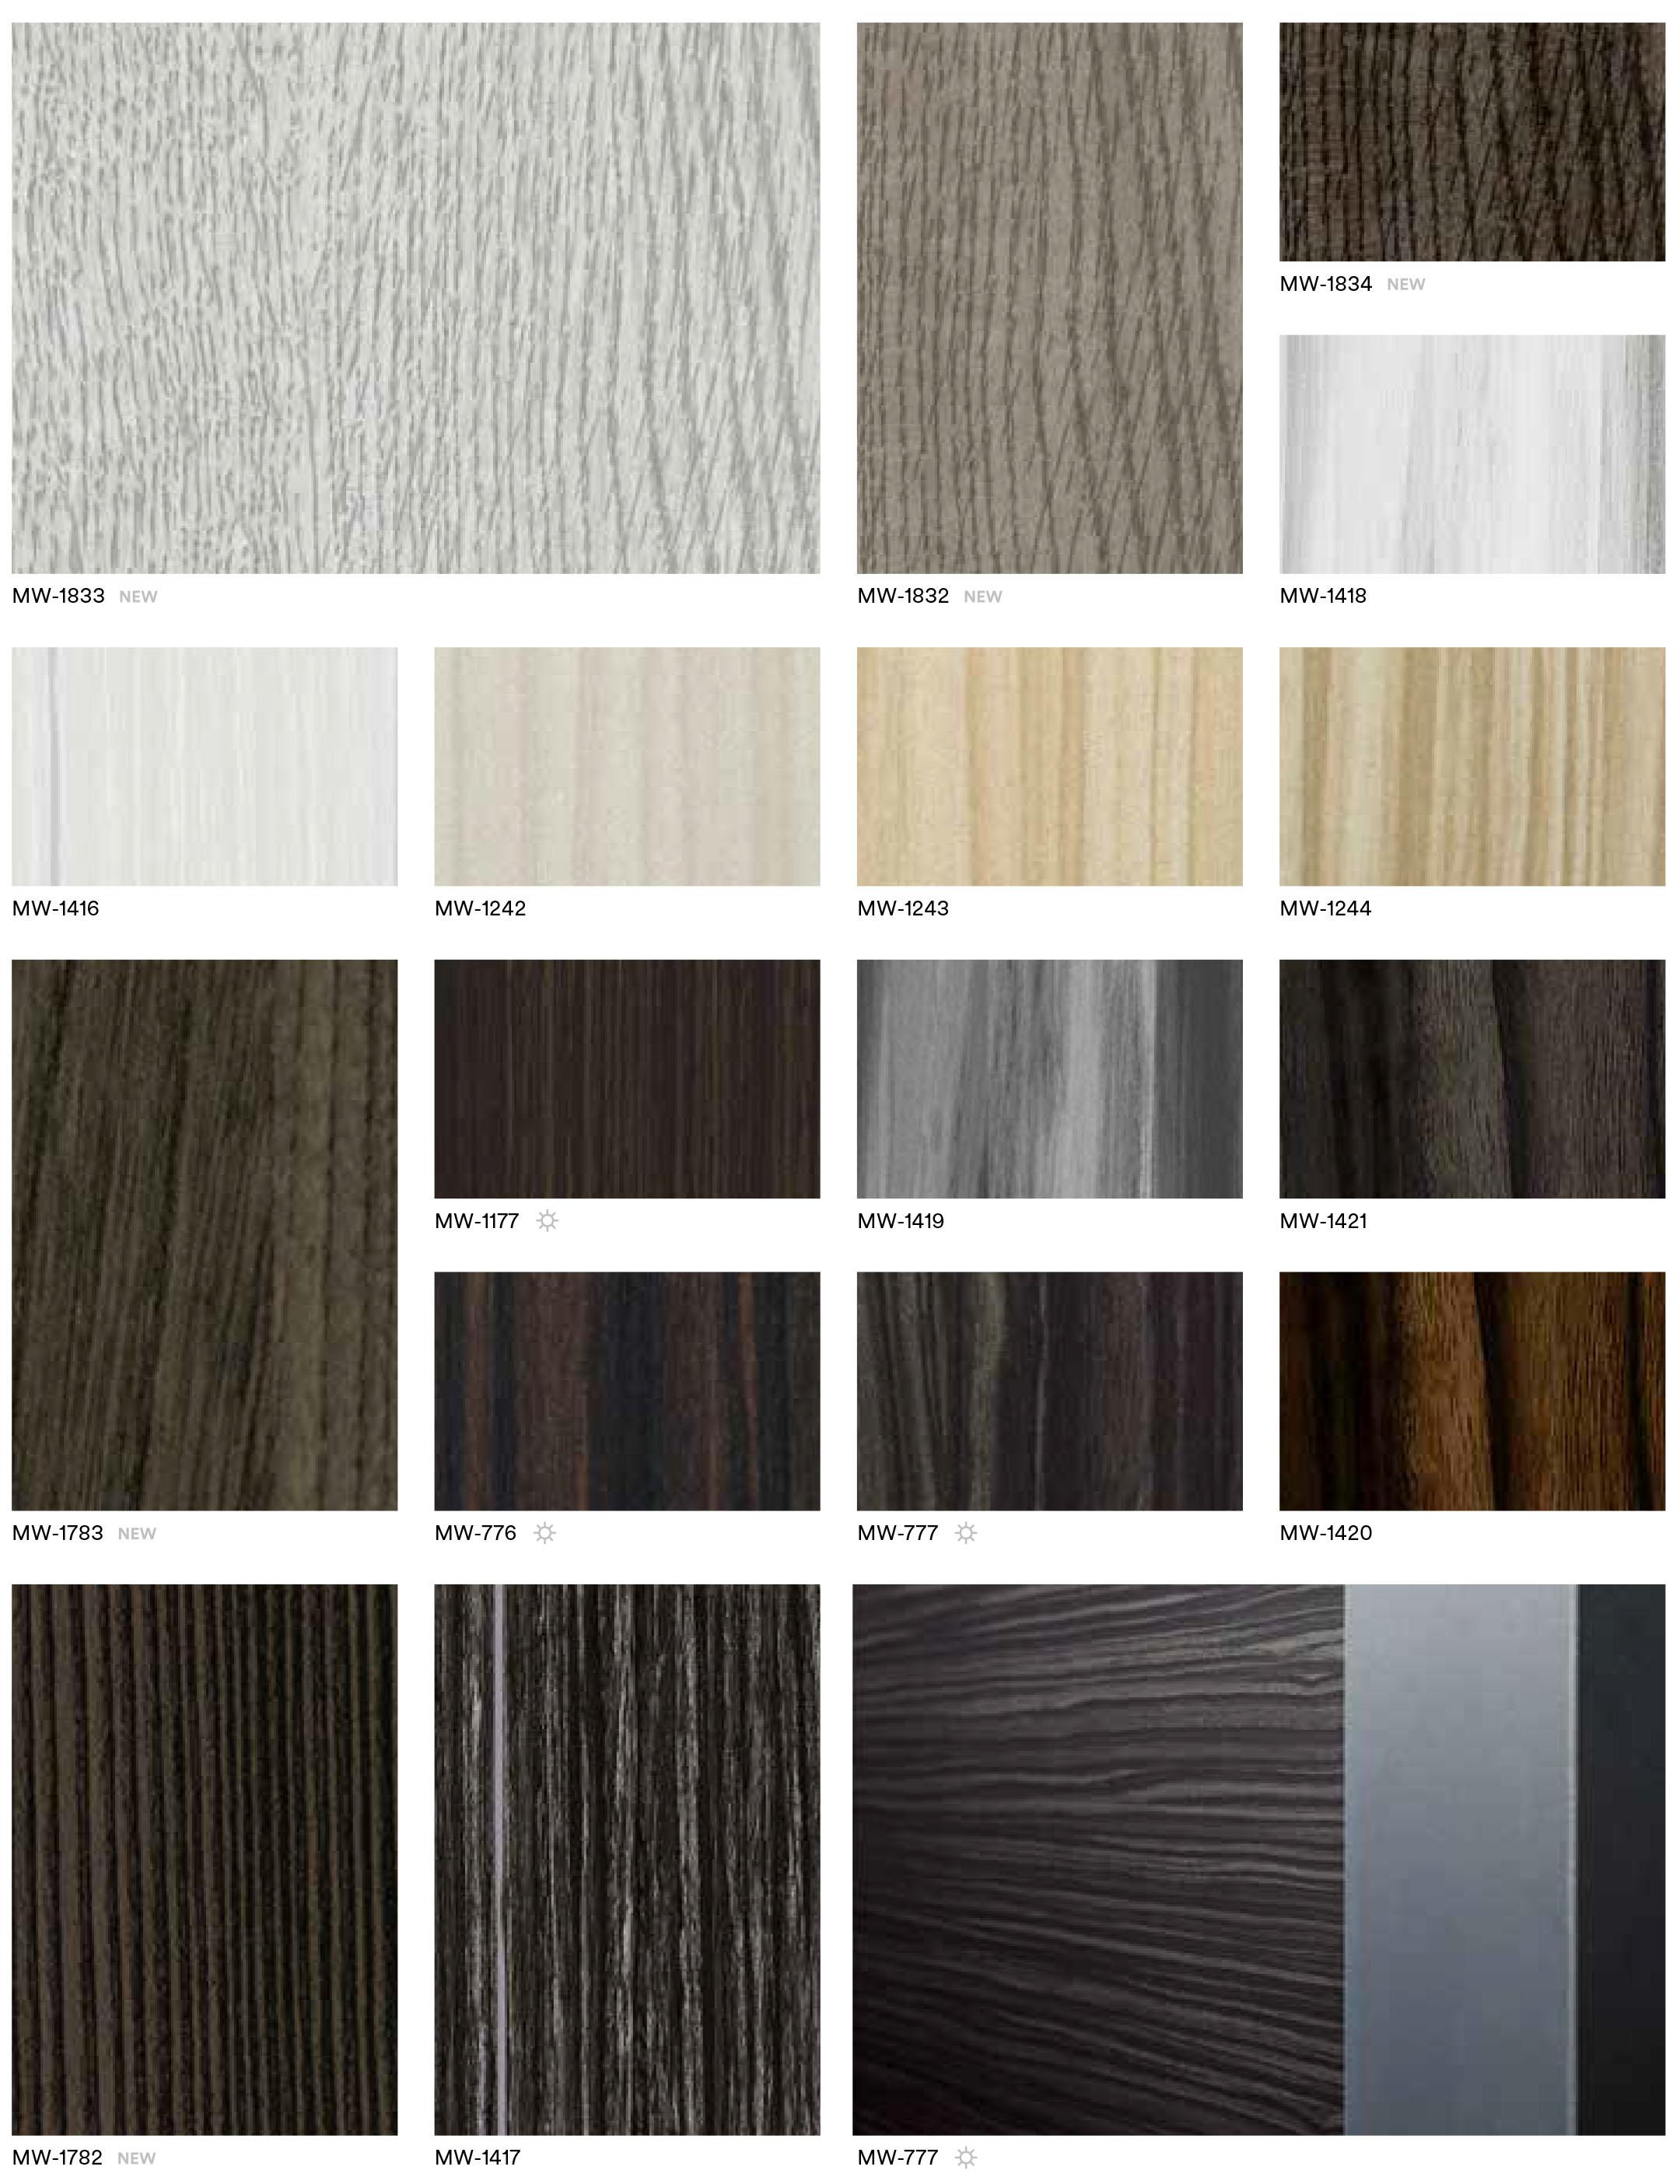 3M Metallic Wood